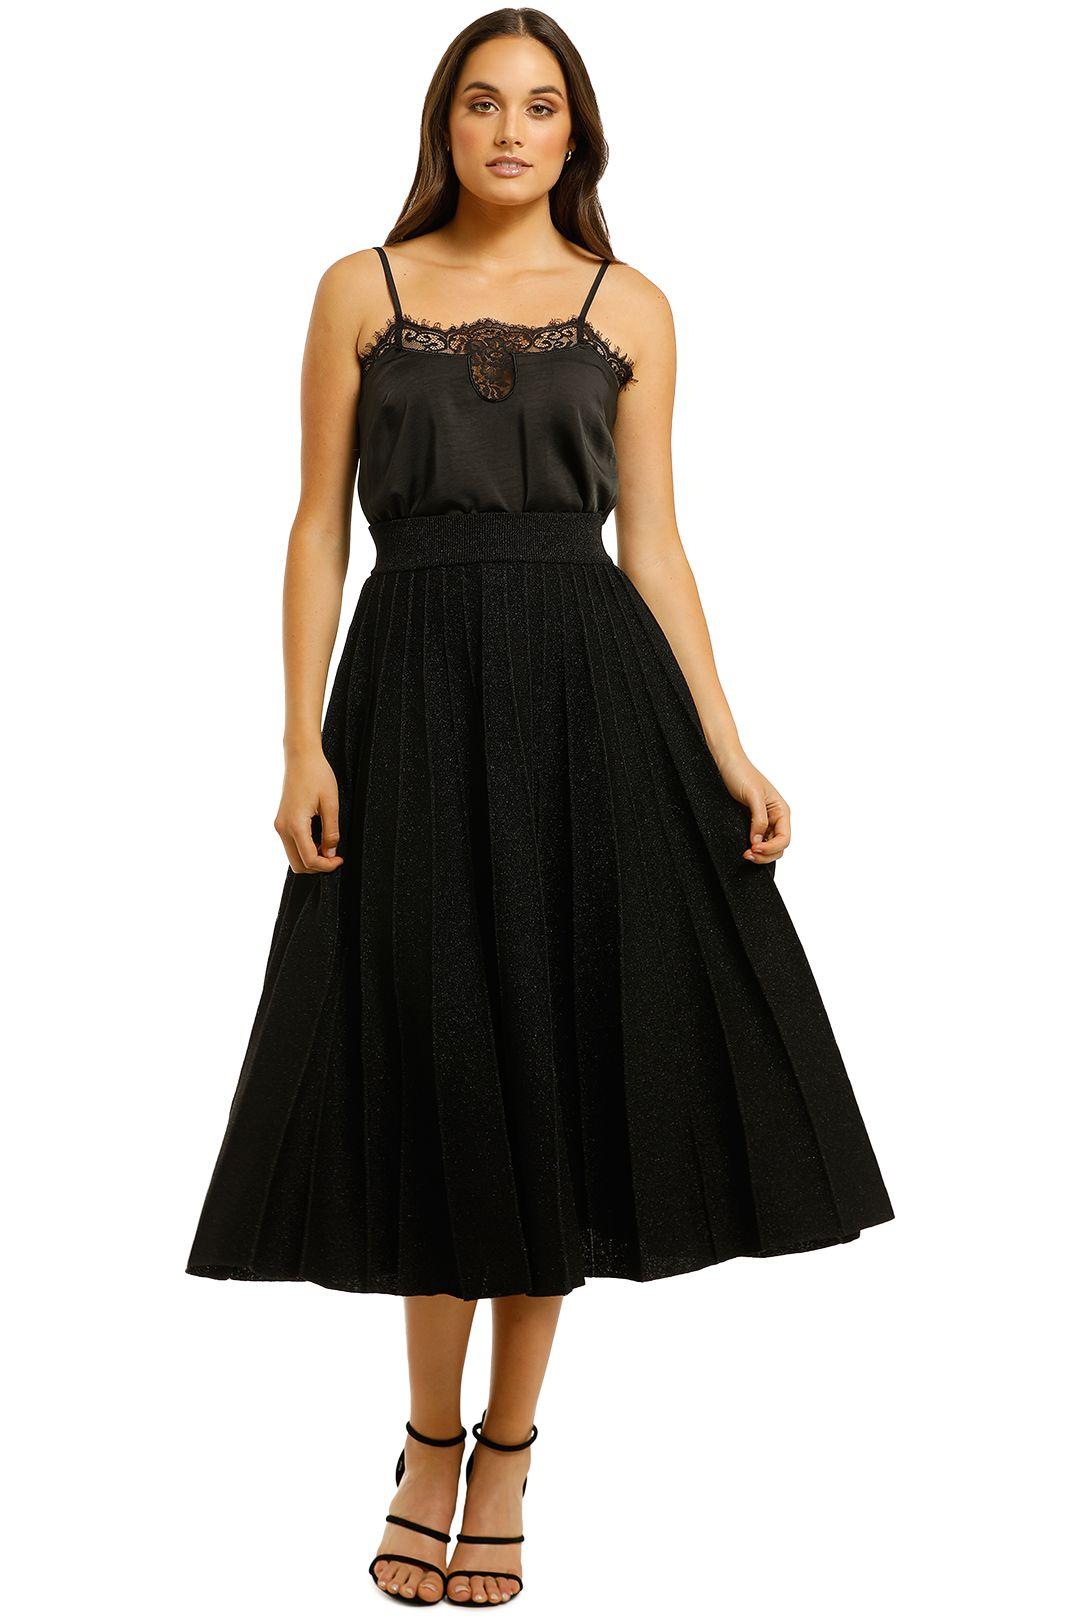 Vestire-Just-A-Little-Crush-Midi-Skirt-Black-Front